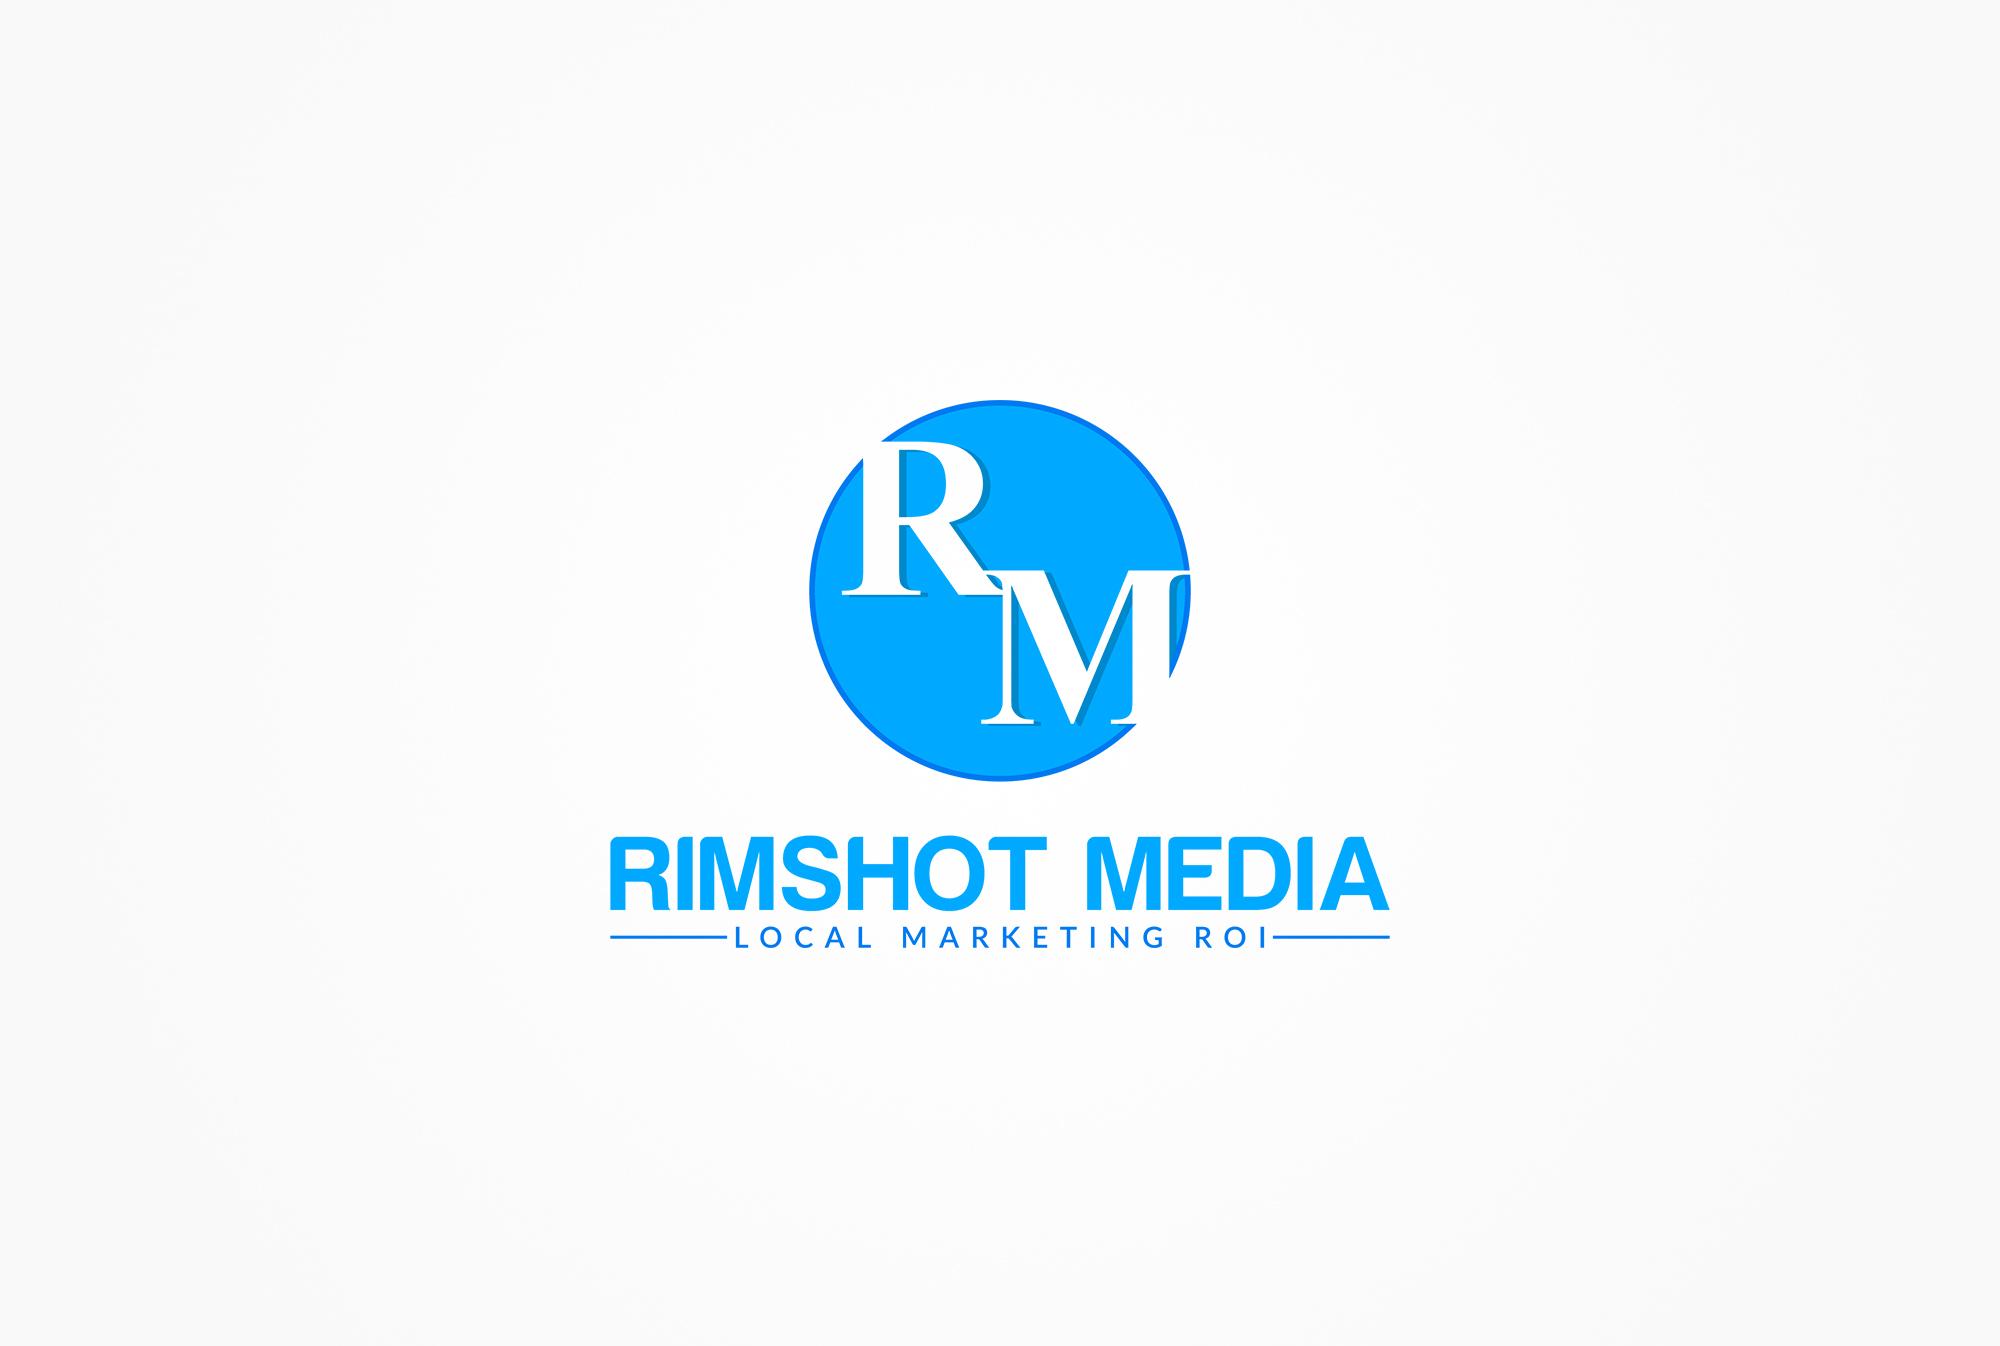 Rimshot-Media-Logo-B Mock-up